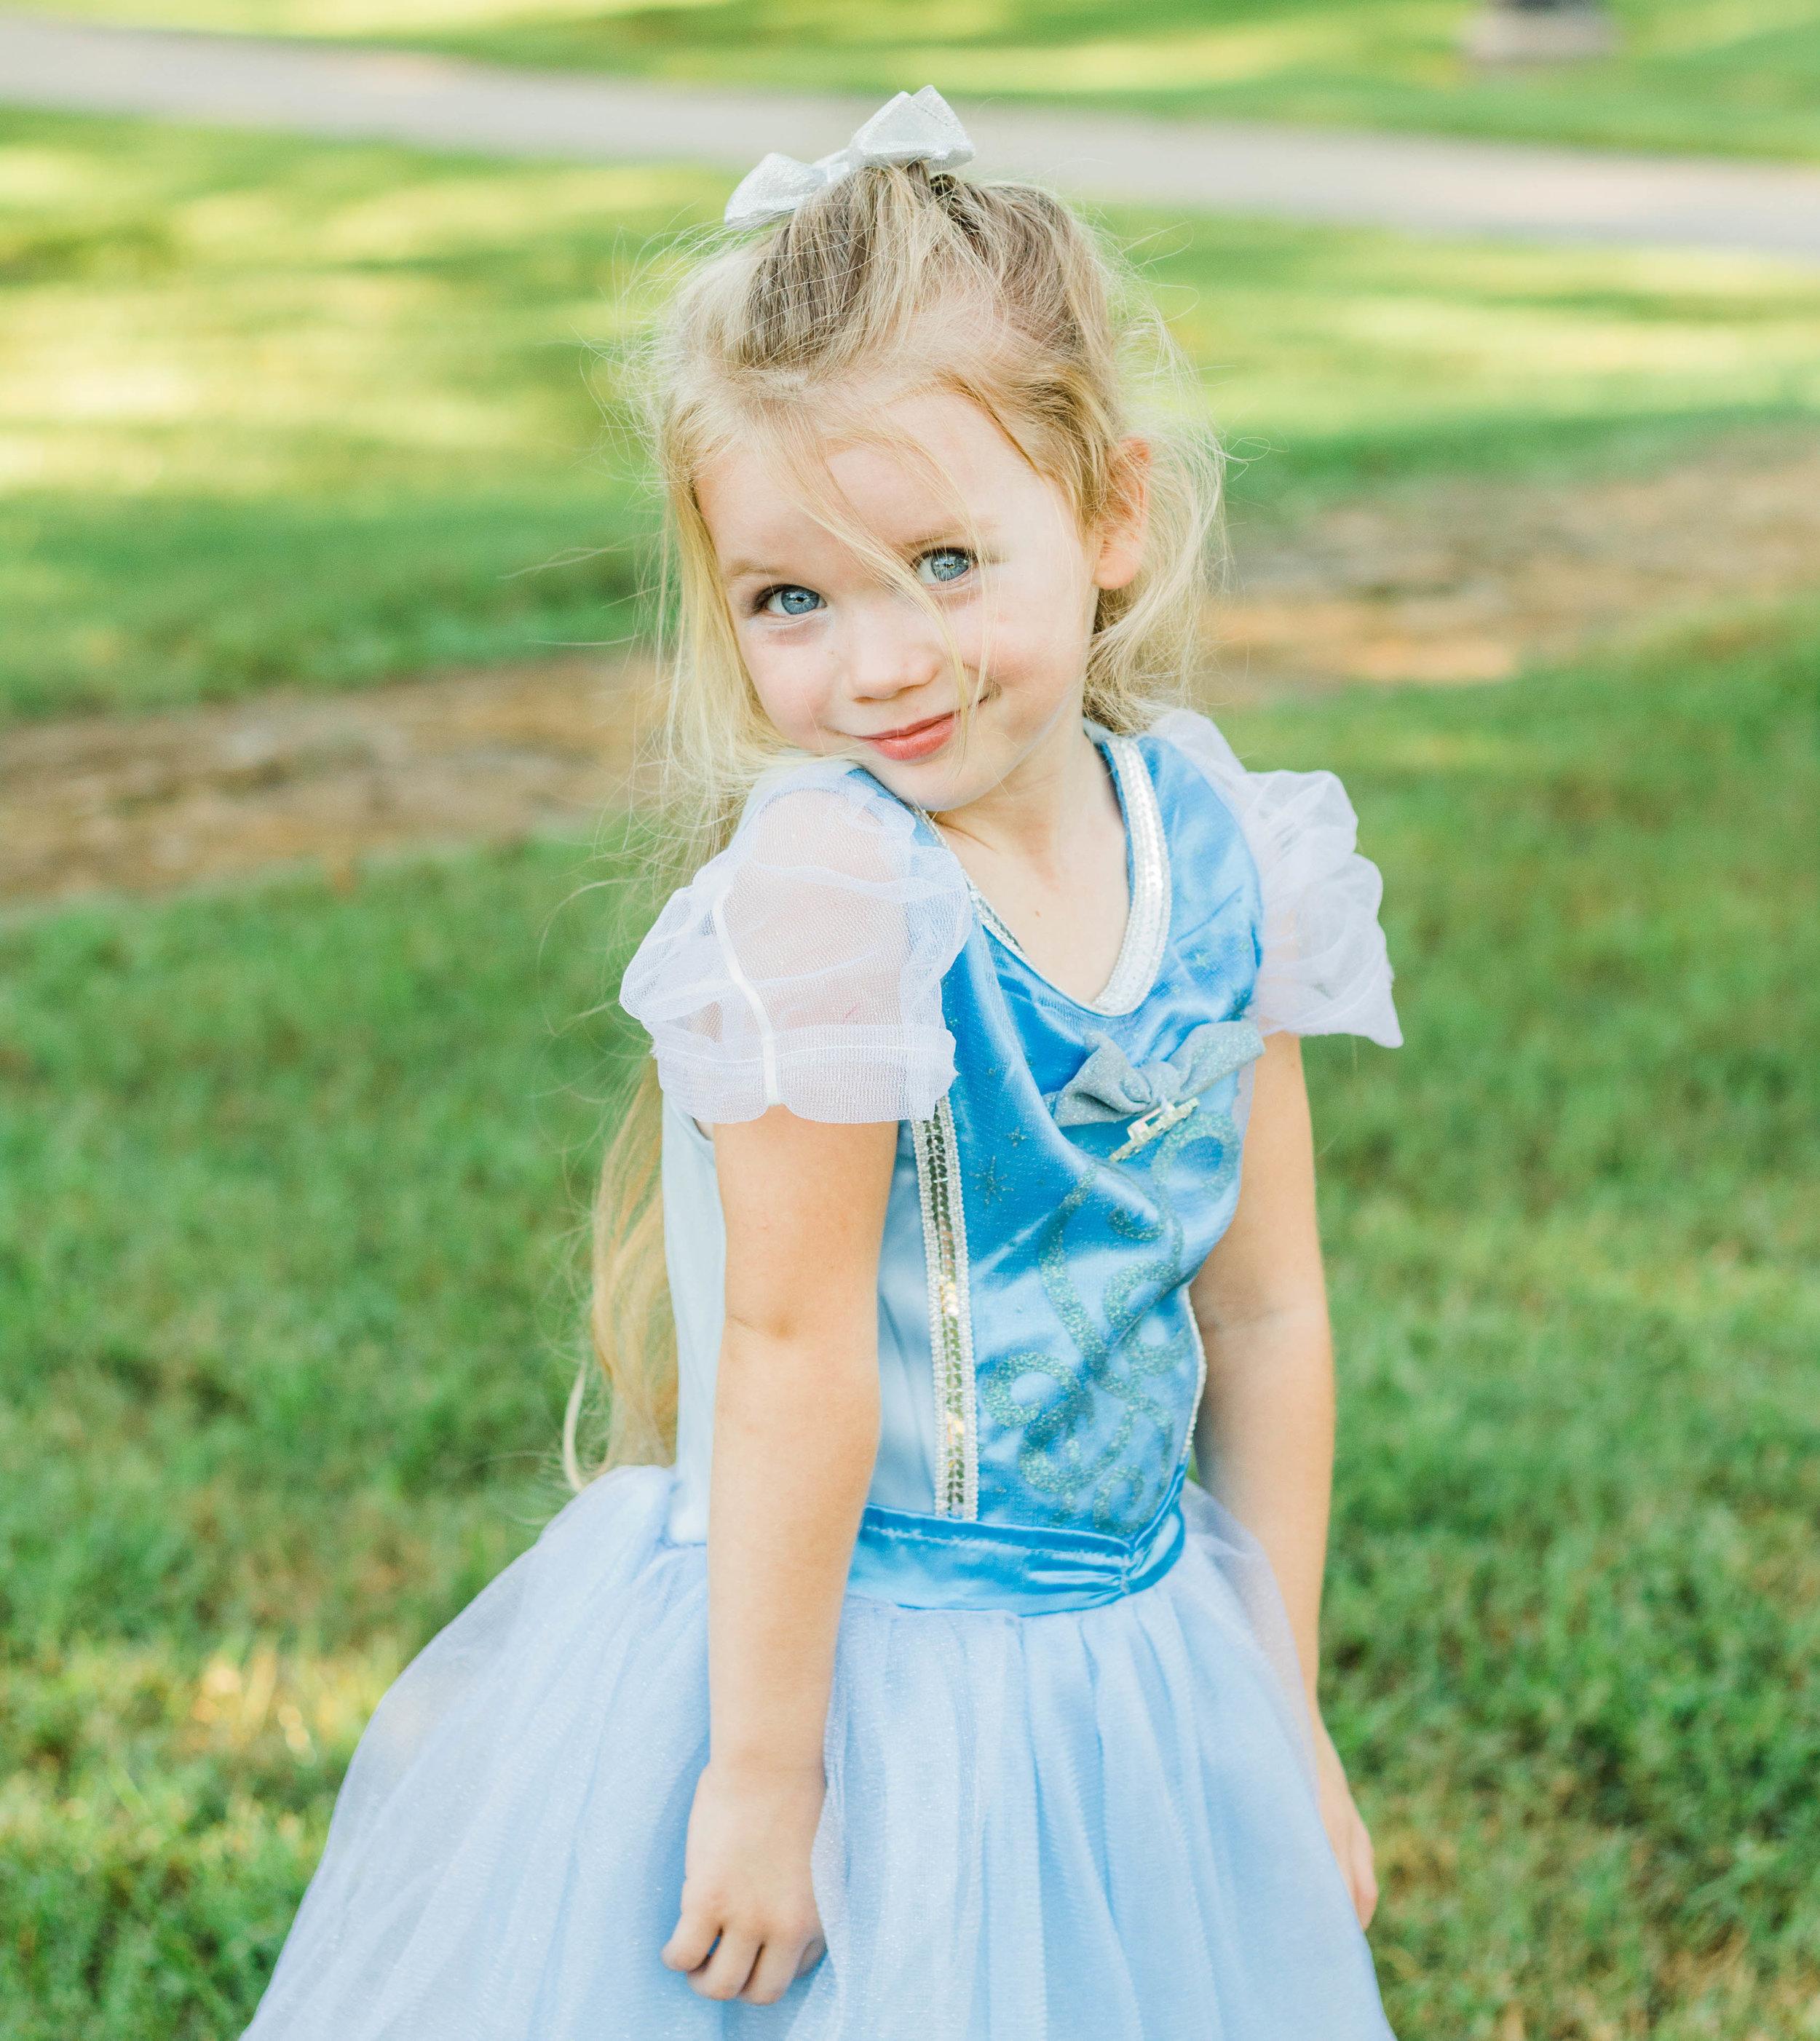 princessriley-10.jpg